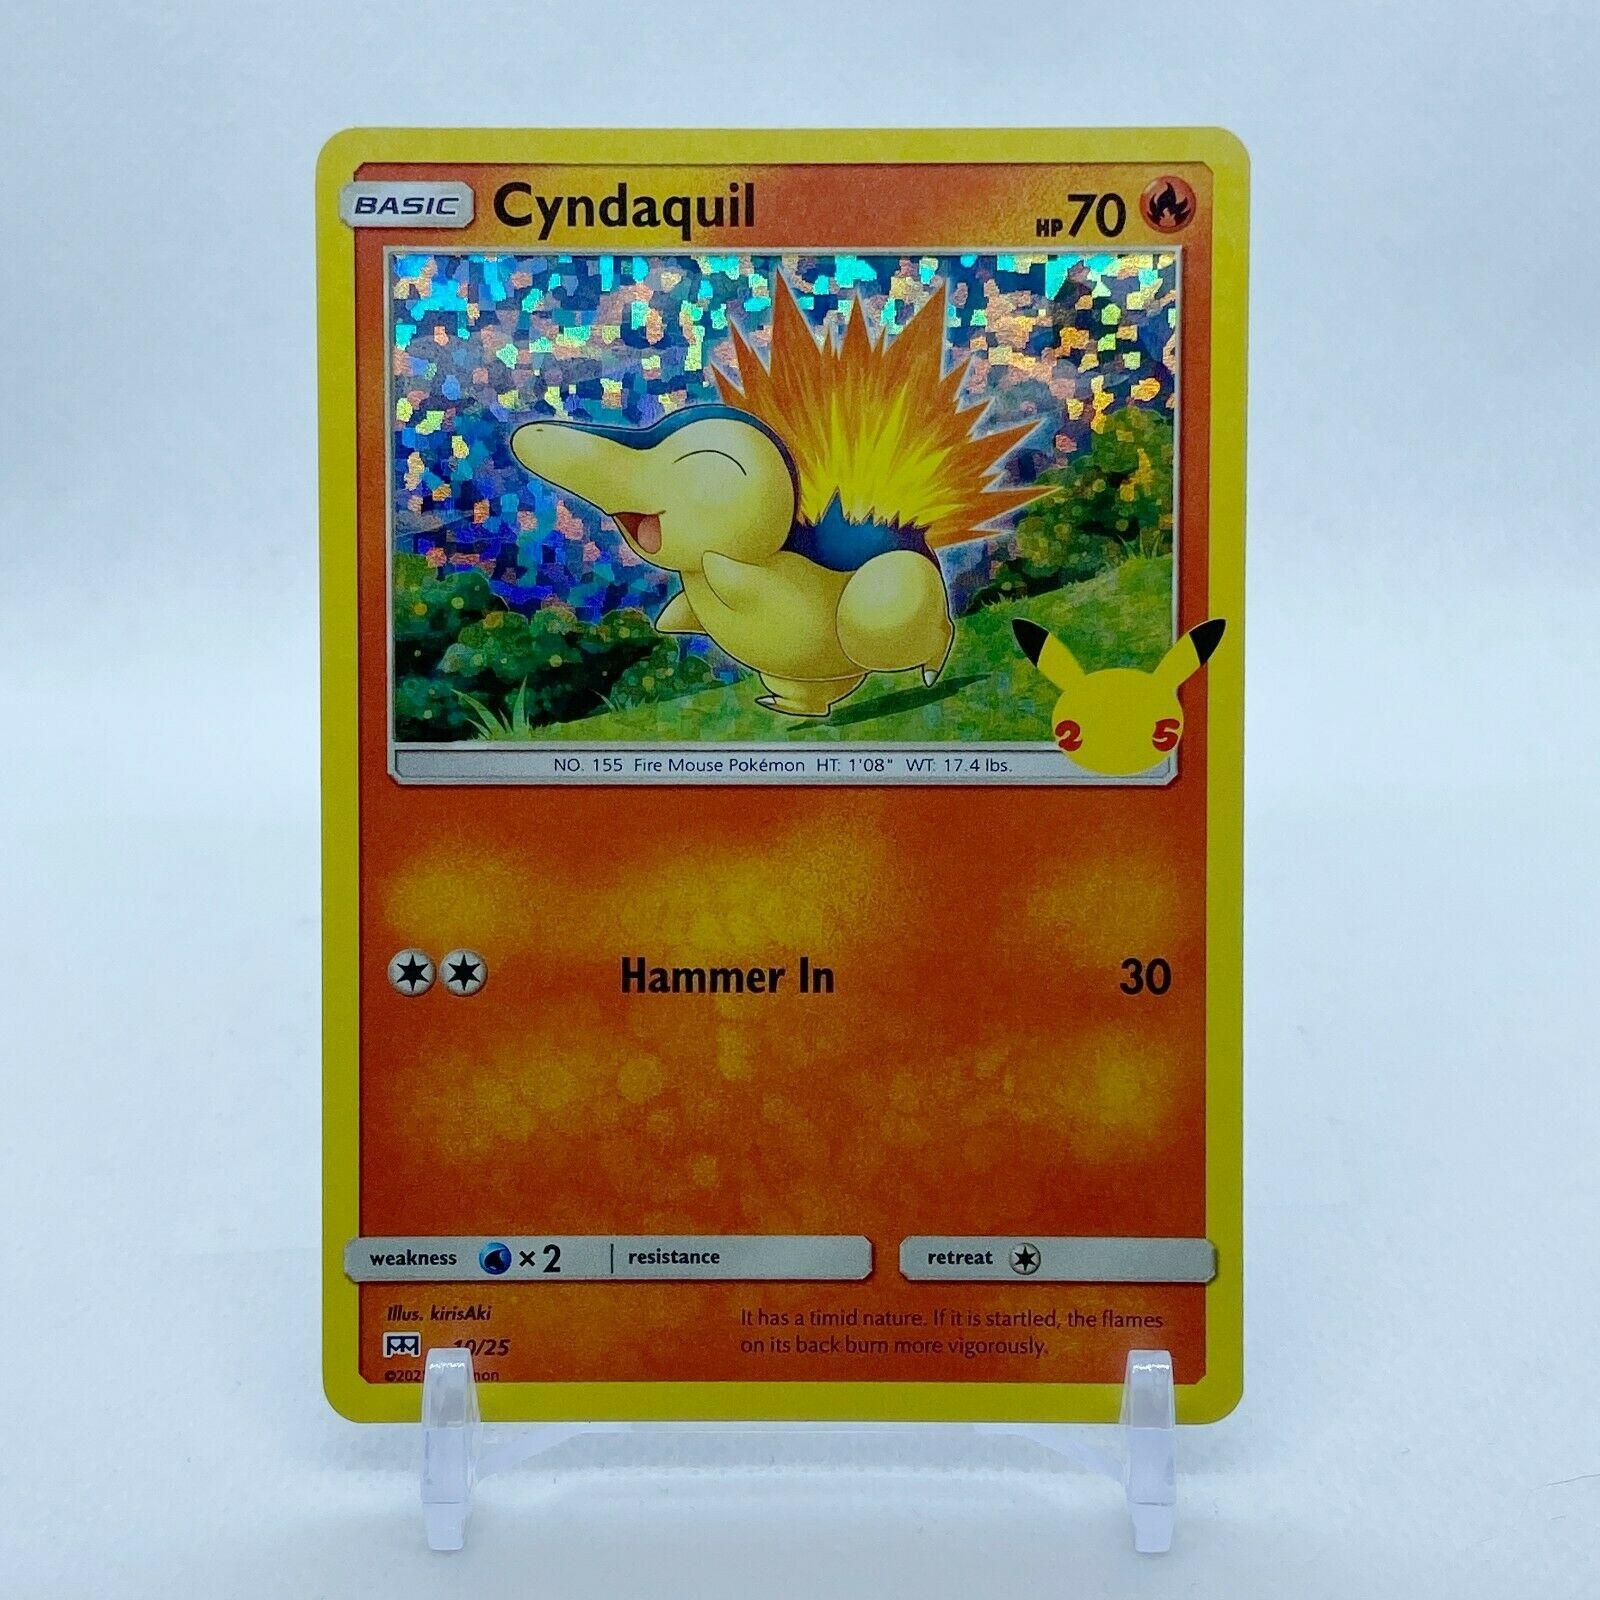 Cyndaquil - 10/25 Mcdonald's Promo 25th Anniversary Holo Starter Pokemon - MINT